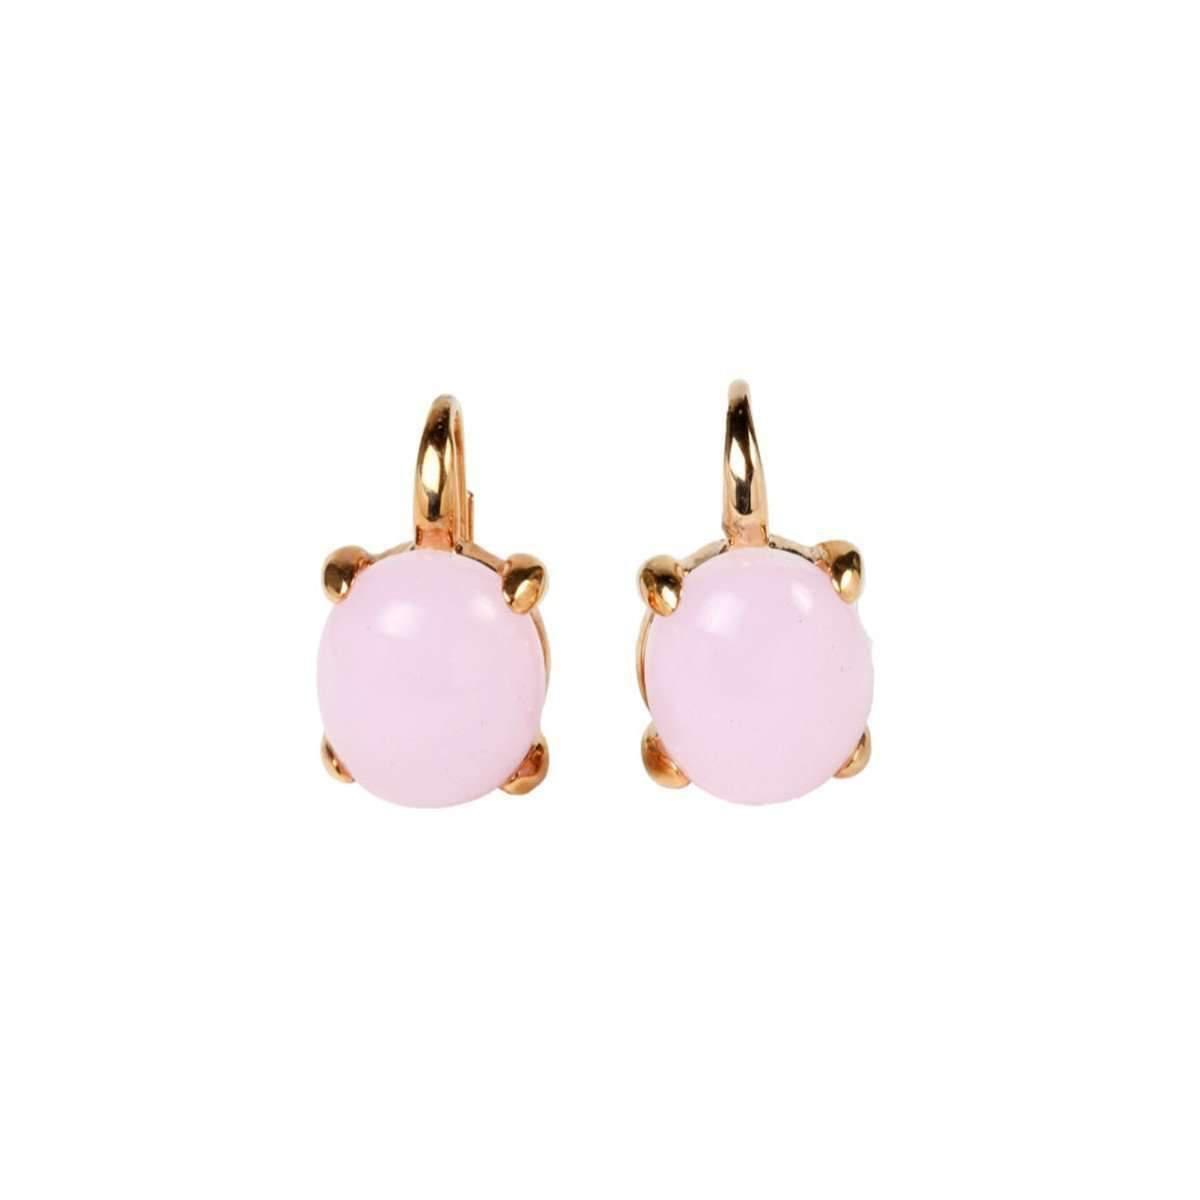 Rina Limor Sunrise Orange Color Crystal Bubble Earrings 9siF8g